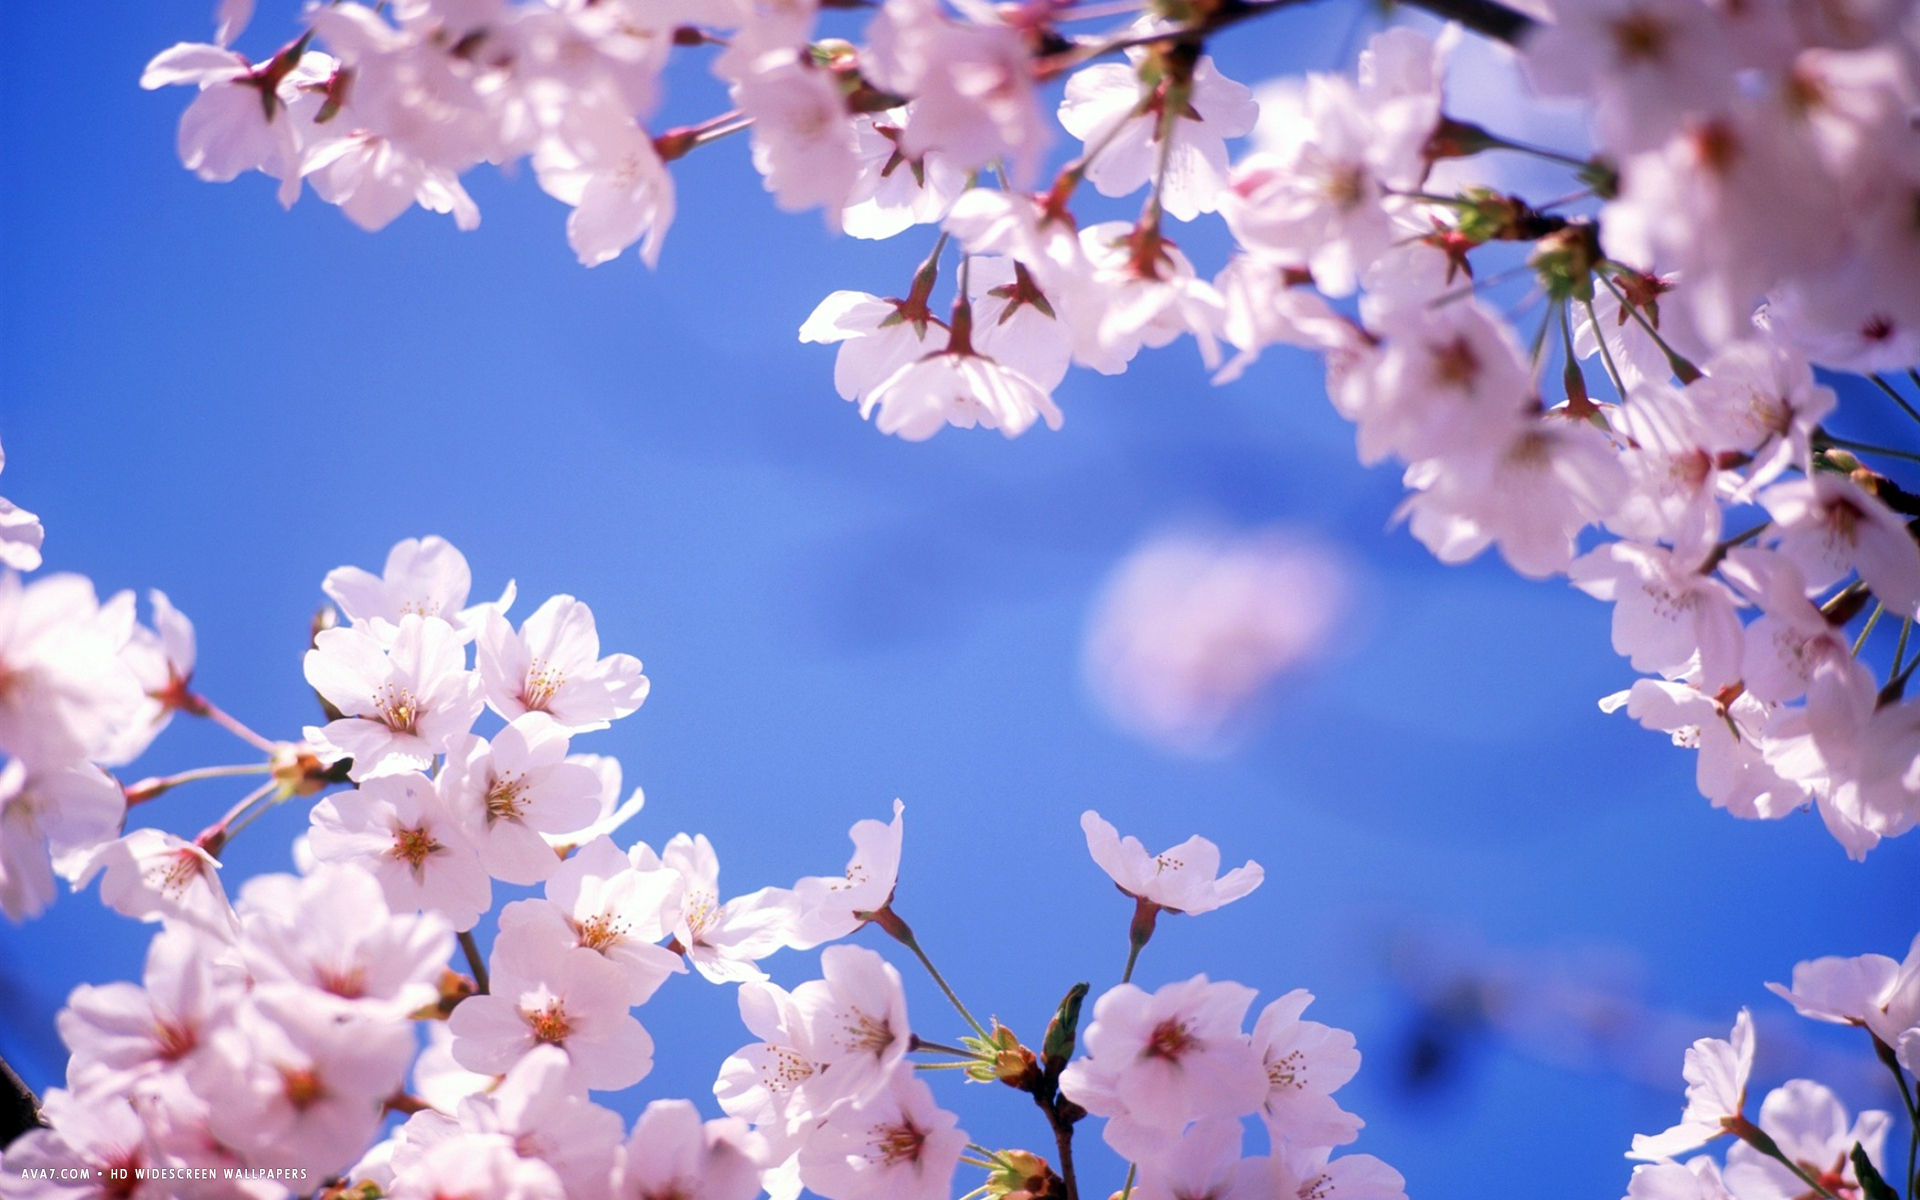 39+ Cherry Blossom HD Wallpaper on WallpaperSafari